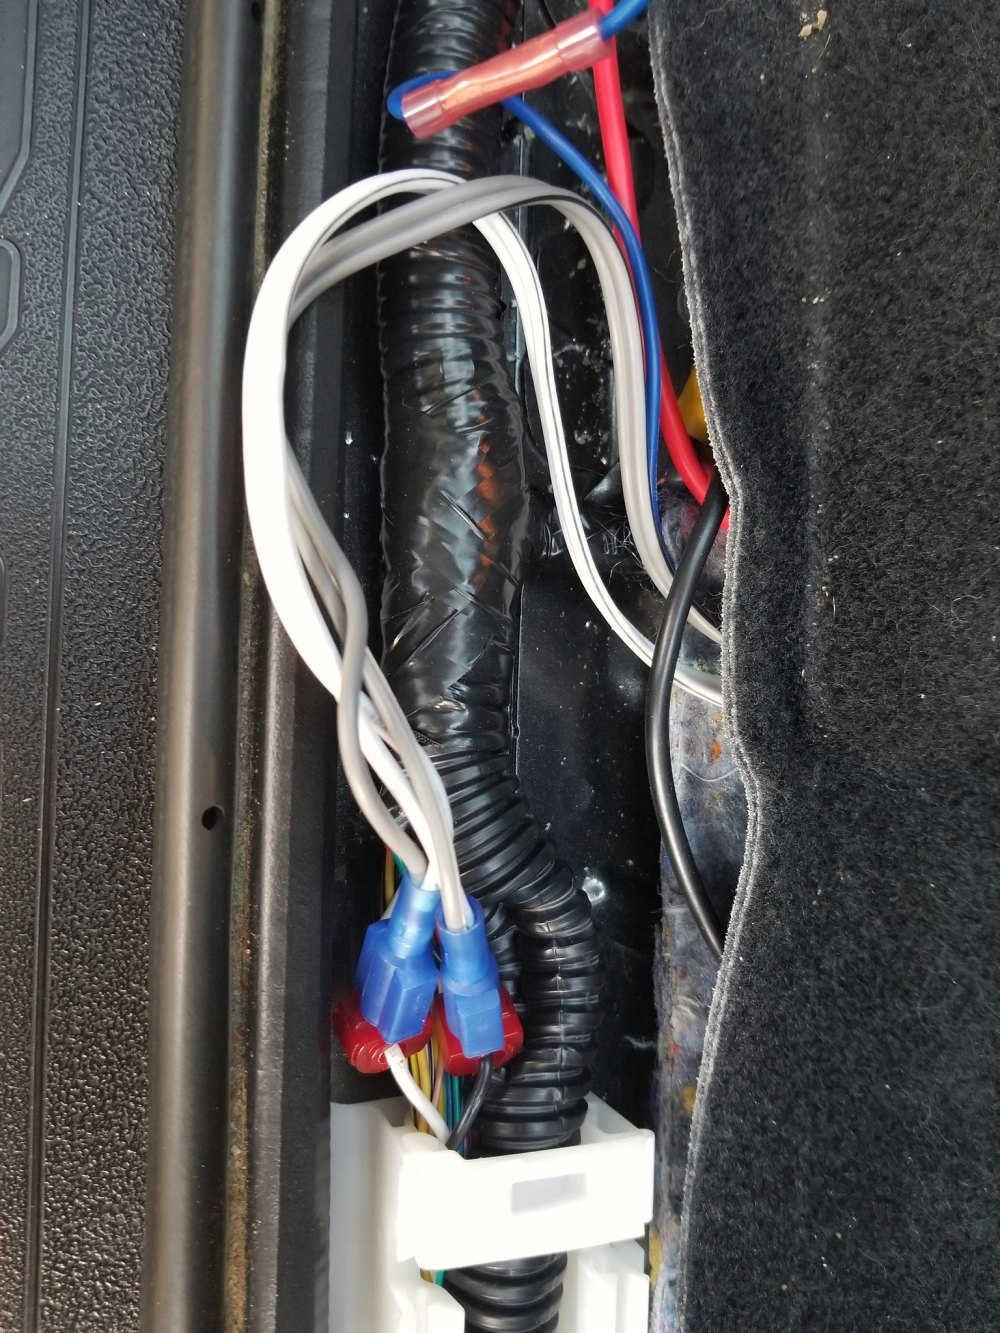 medium resolution of  kicker hideaway issues tacoma world on kicker subwoofer system kicker l7 wiring diagram avicd3wiringharnessdiagrampioneeravicd3wiringdiagrampioneer